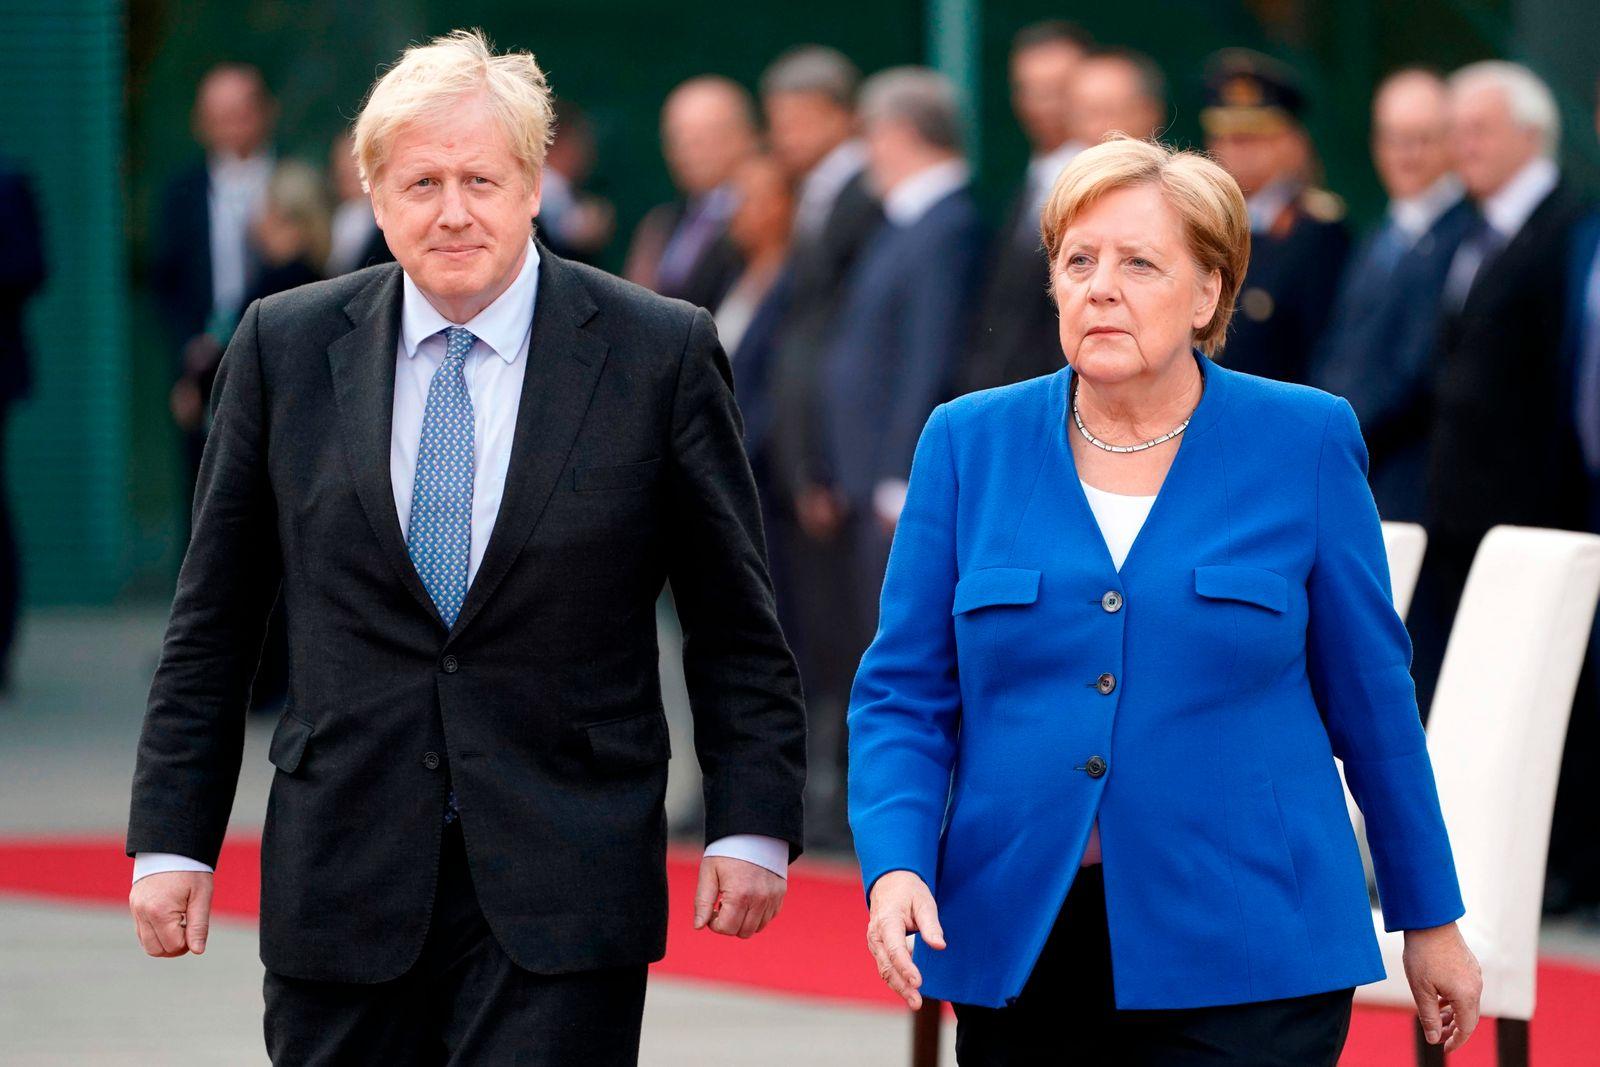 Boris Johnson/ Angela Merkel